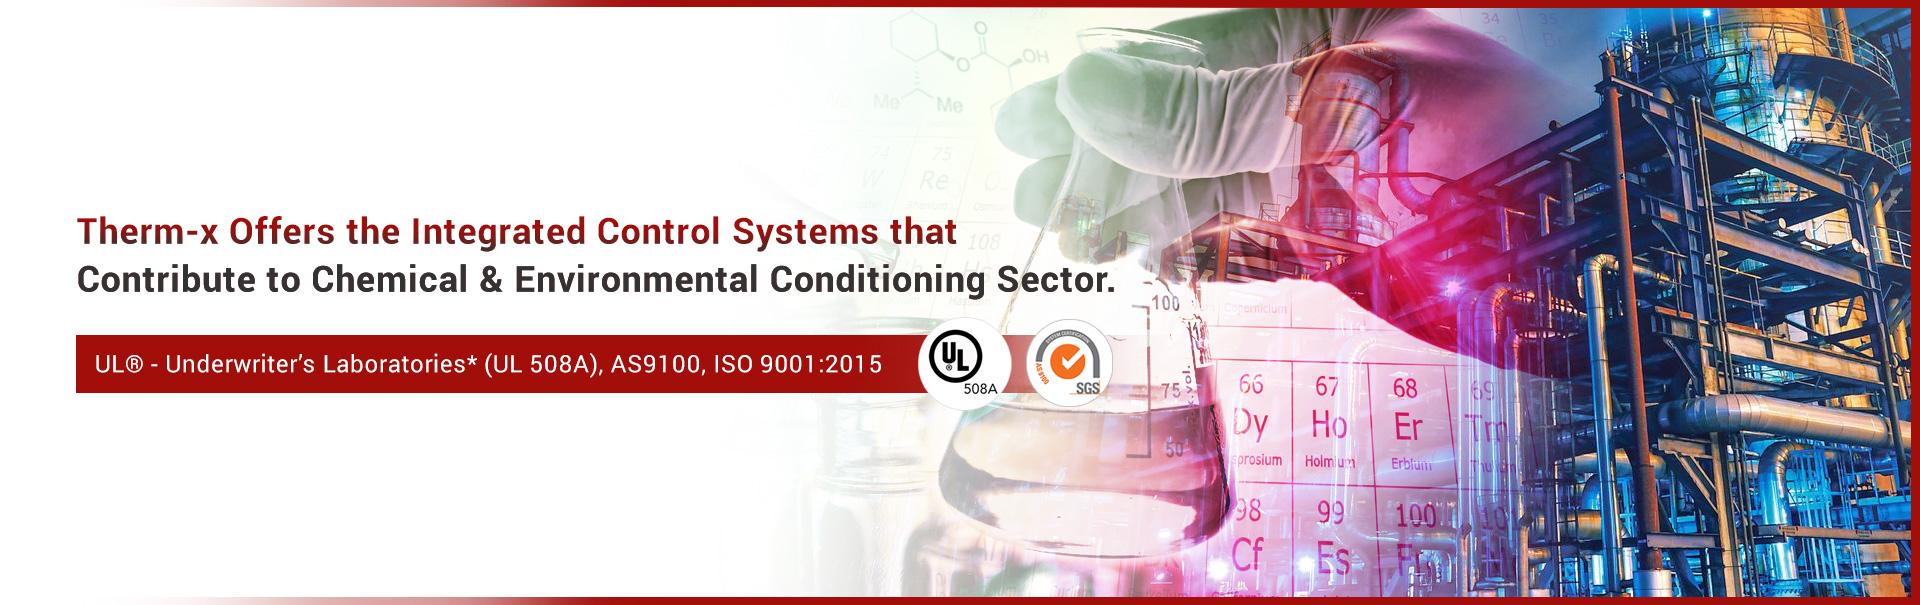 Chemical or Enviormental Conditoning